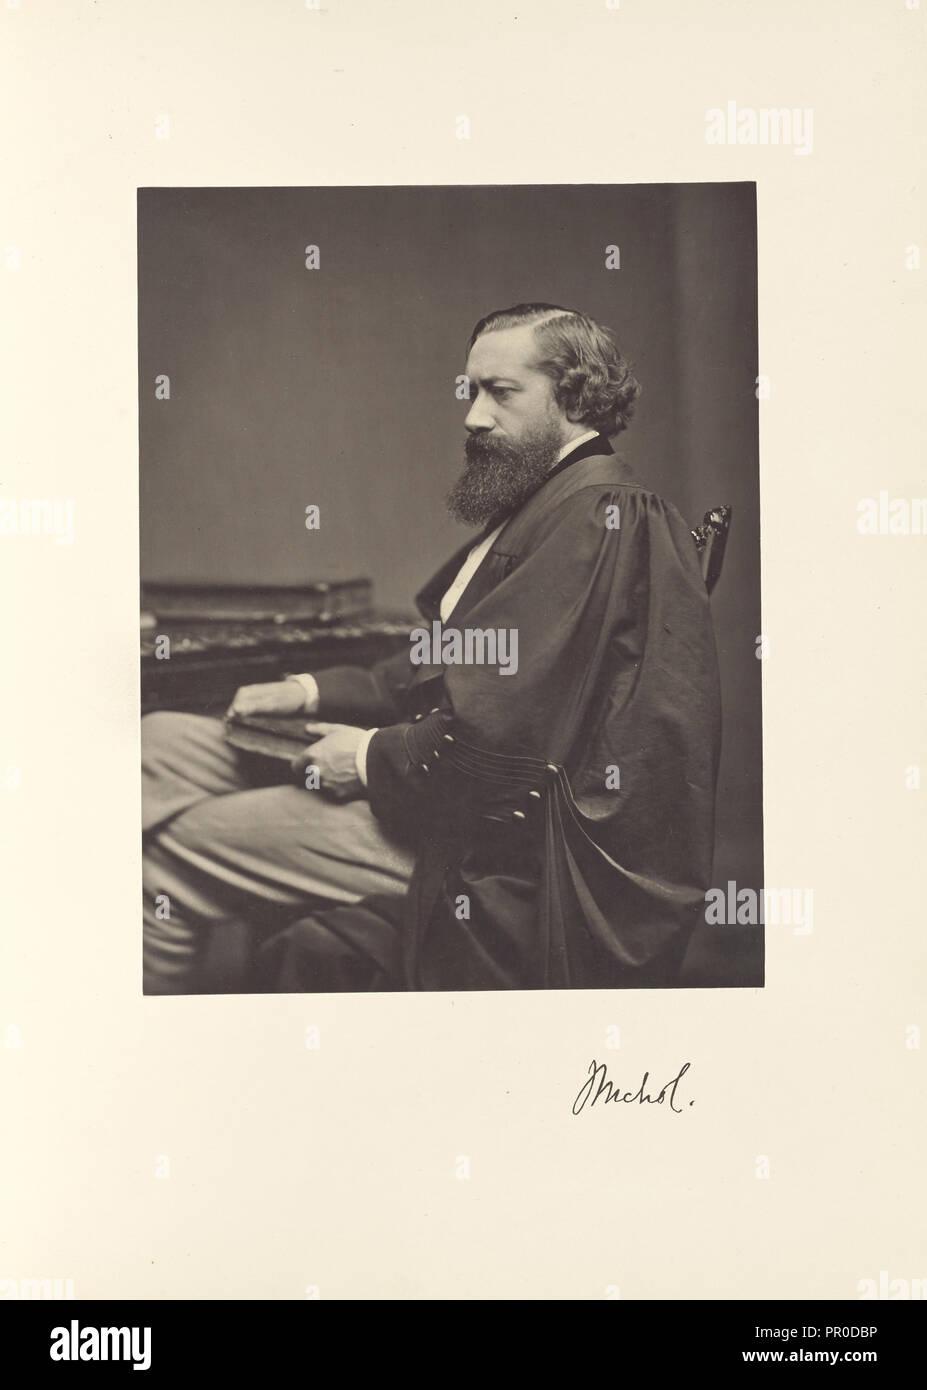 John Nichol, B.A., Oxon., Professor of English Language and Literature; Thomas Annan, Scottish,1829 - 1887, Glasgow, Scotland - Stock Image